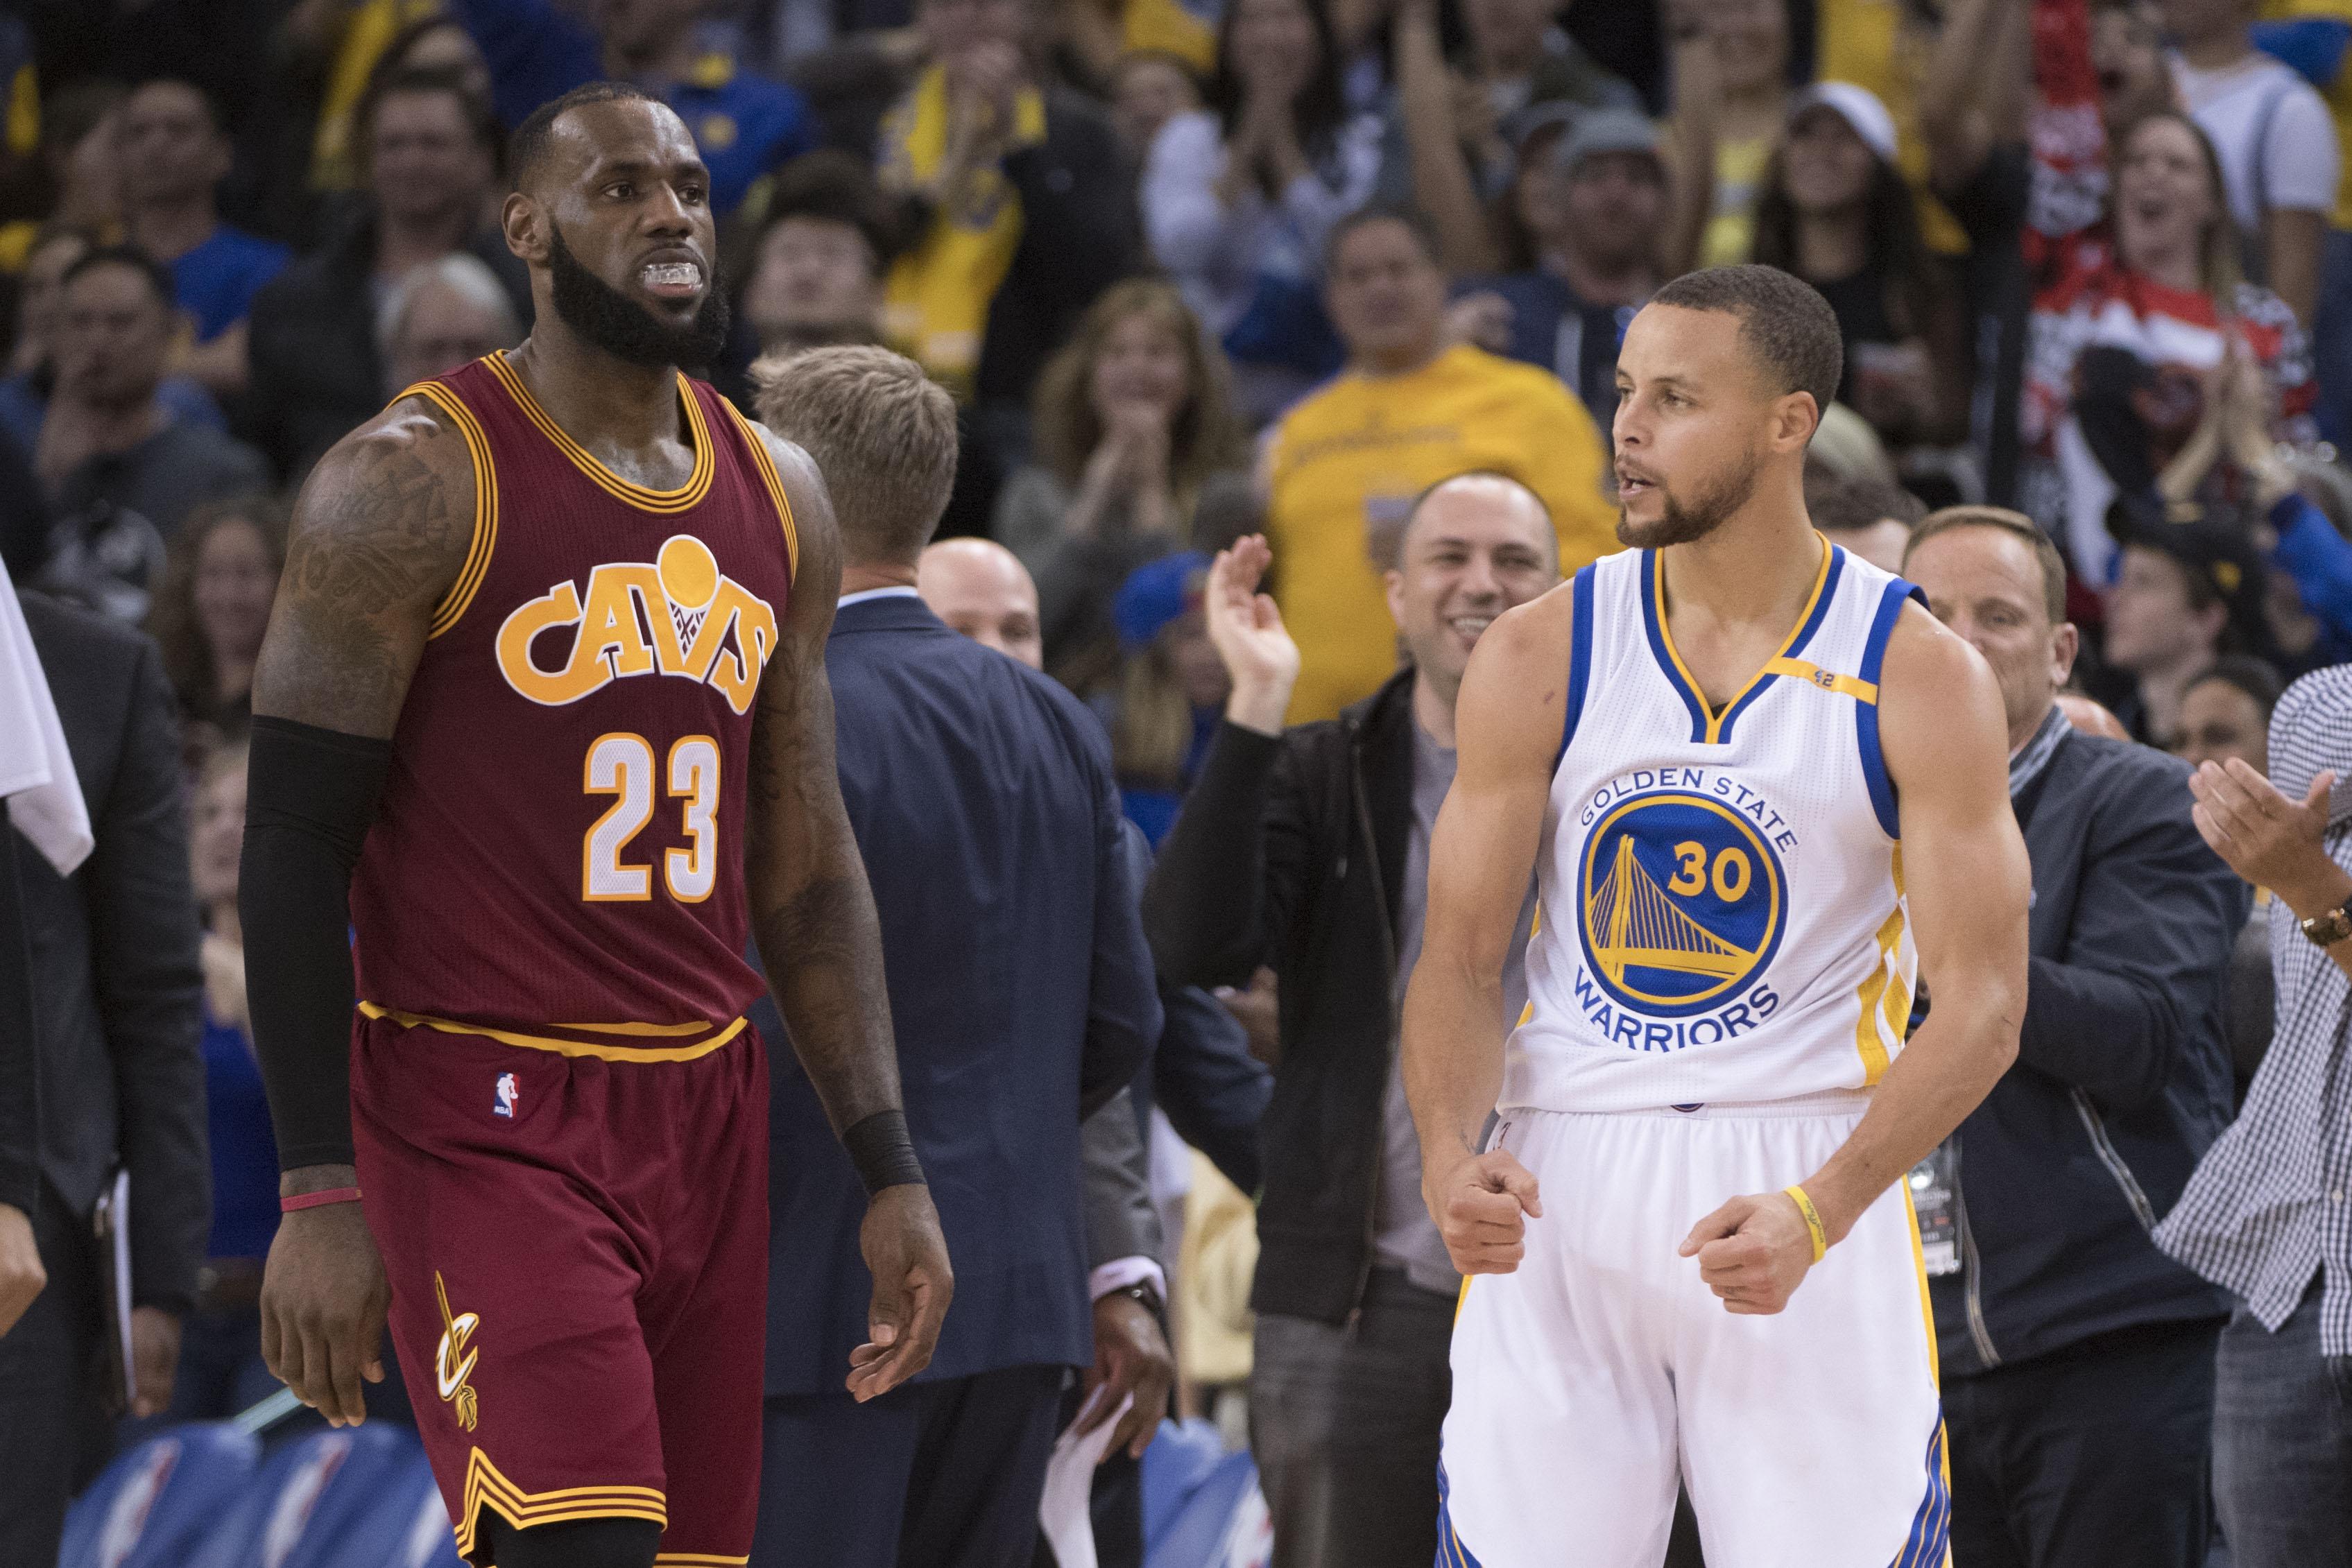 The final NBA power rankings of the 2016-17 season